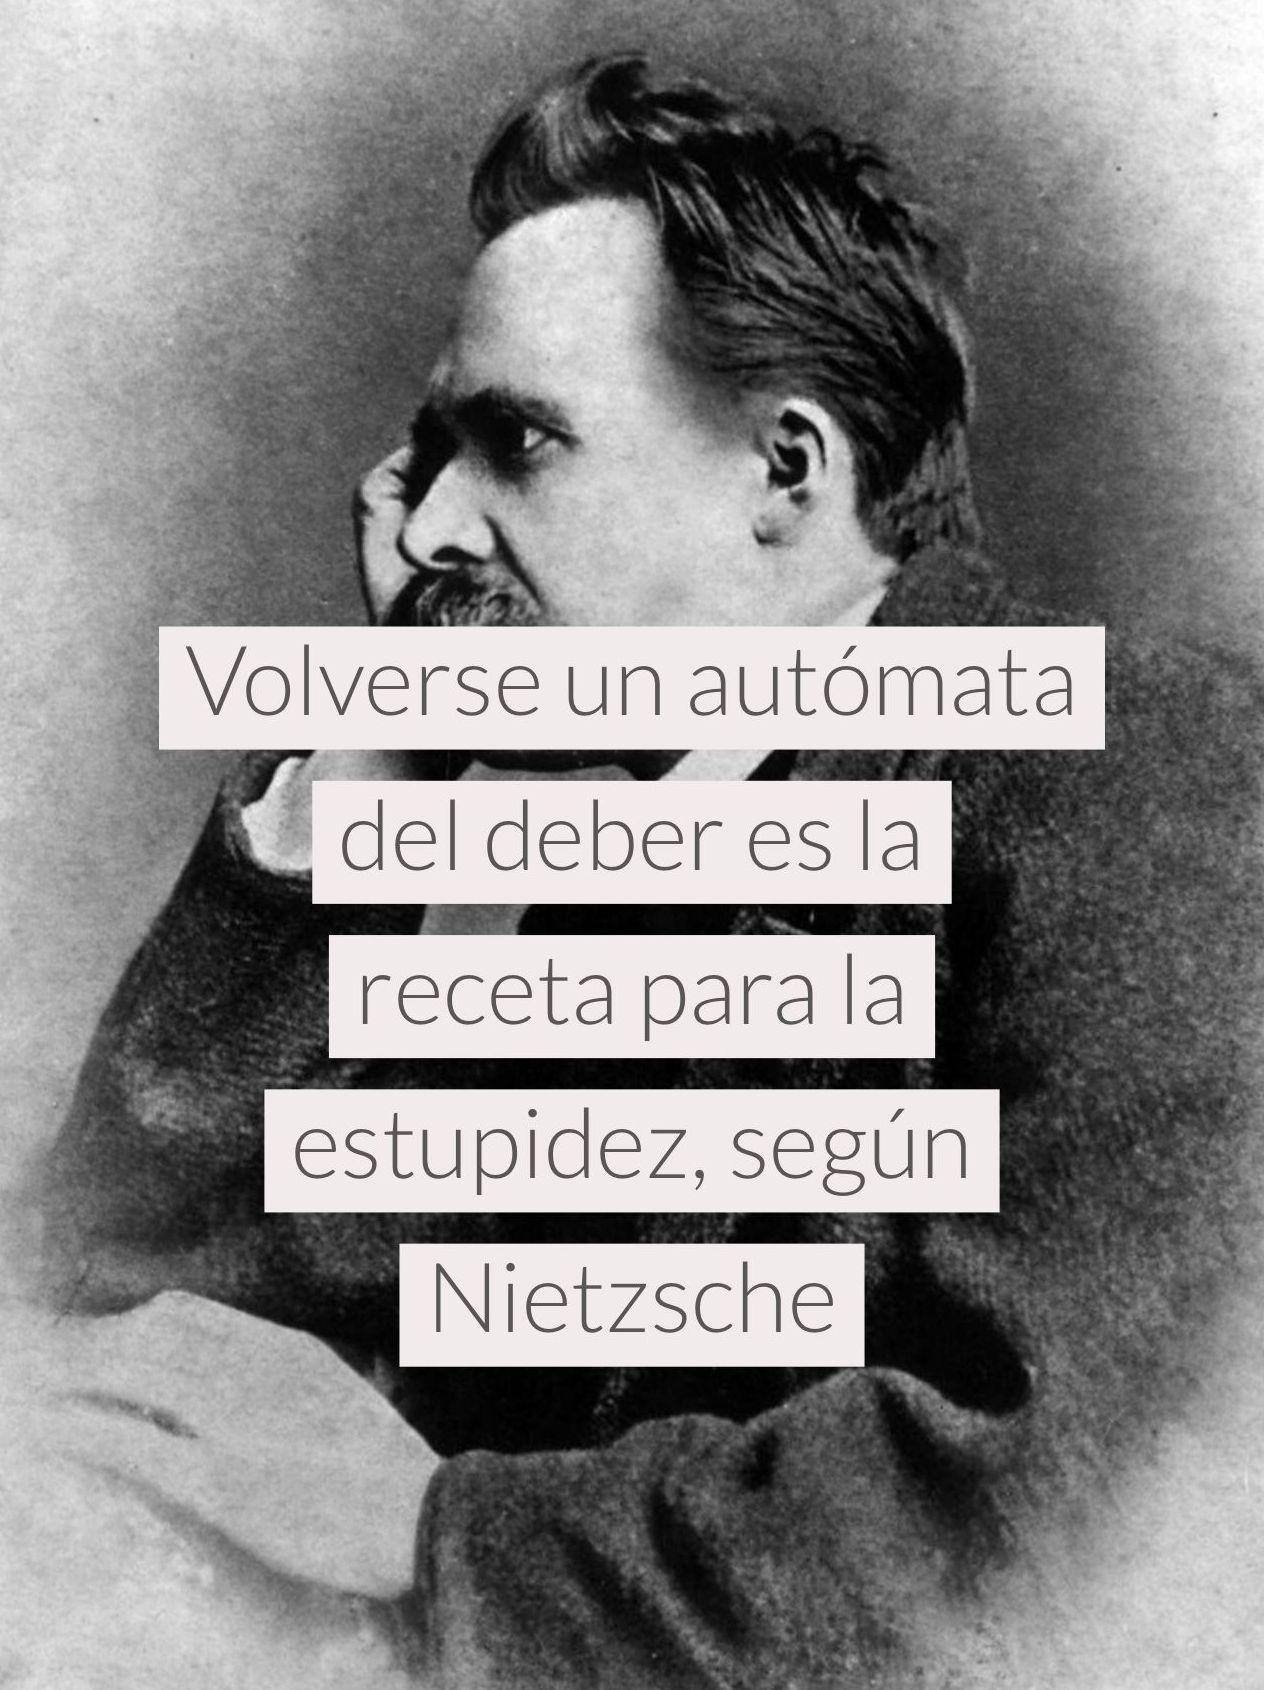 Volverse un autómata del deber es la receta para la estupidez, según Nietzsche